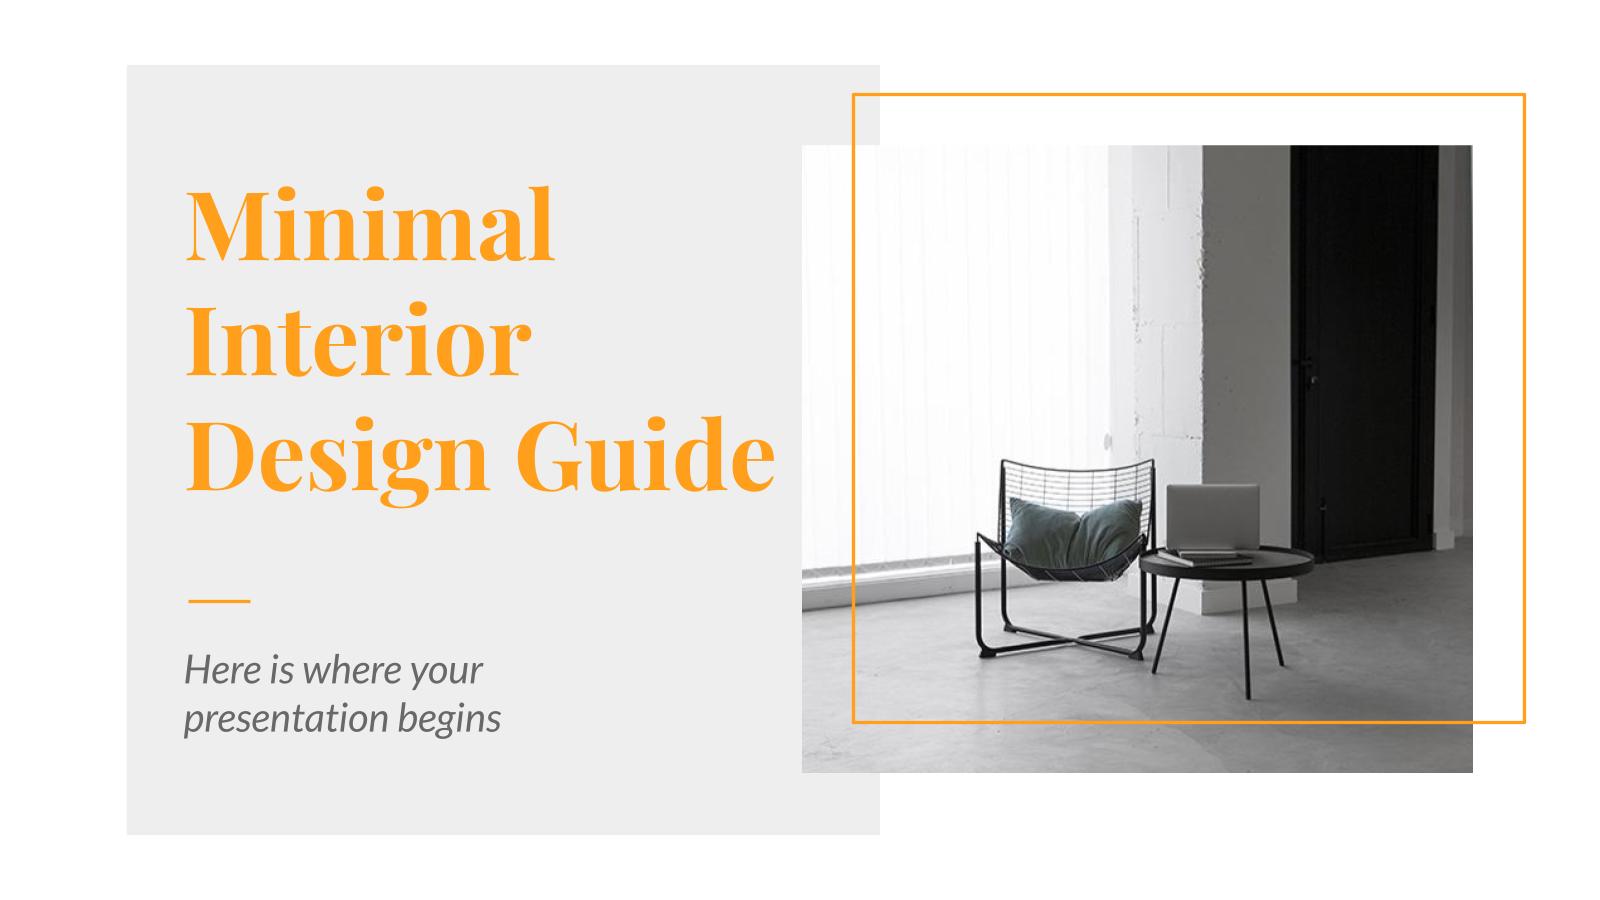 Minimal Interior Design Guide presentation template